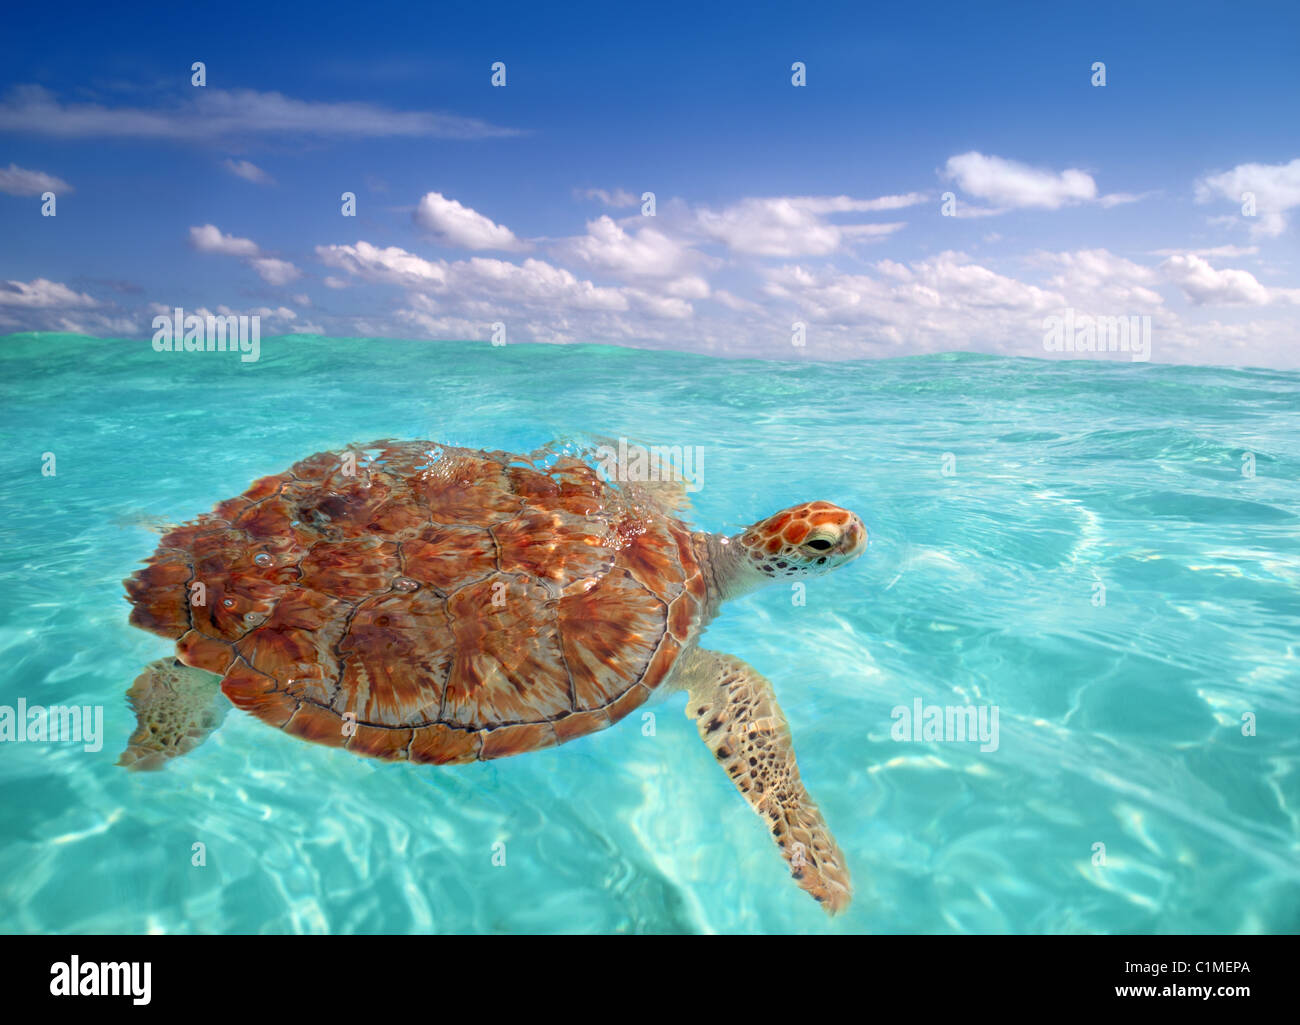 Tartaruga Verde Chelonia Mydas Mar dei Caraibi famiglia Cheloniidae superficie di acqua Foto Stock